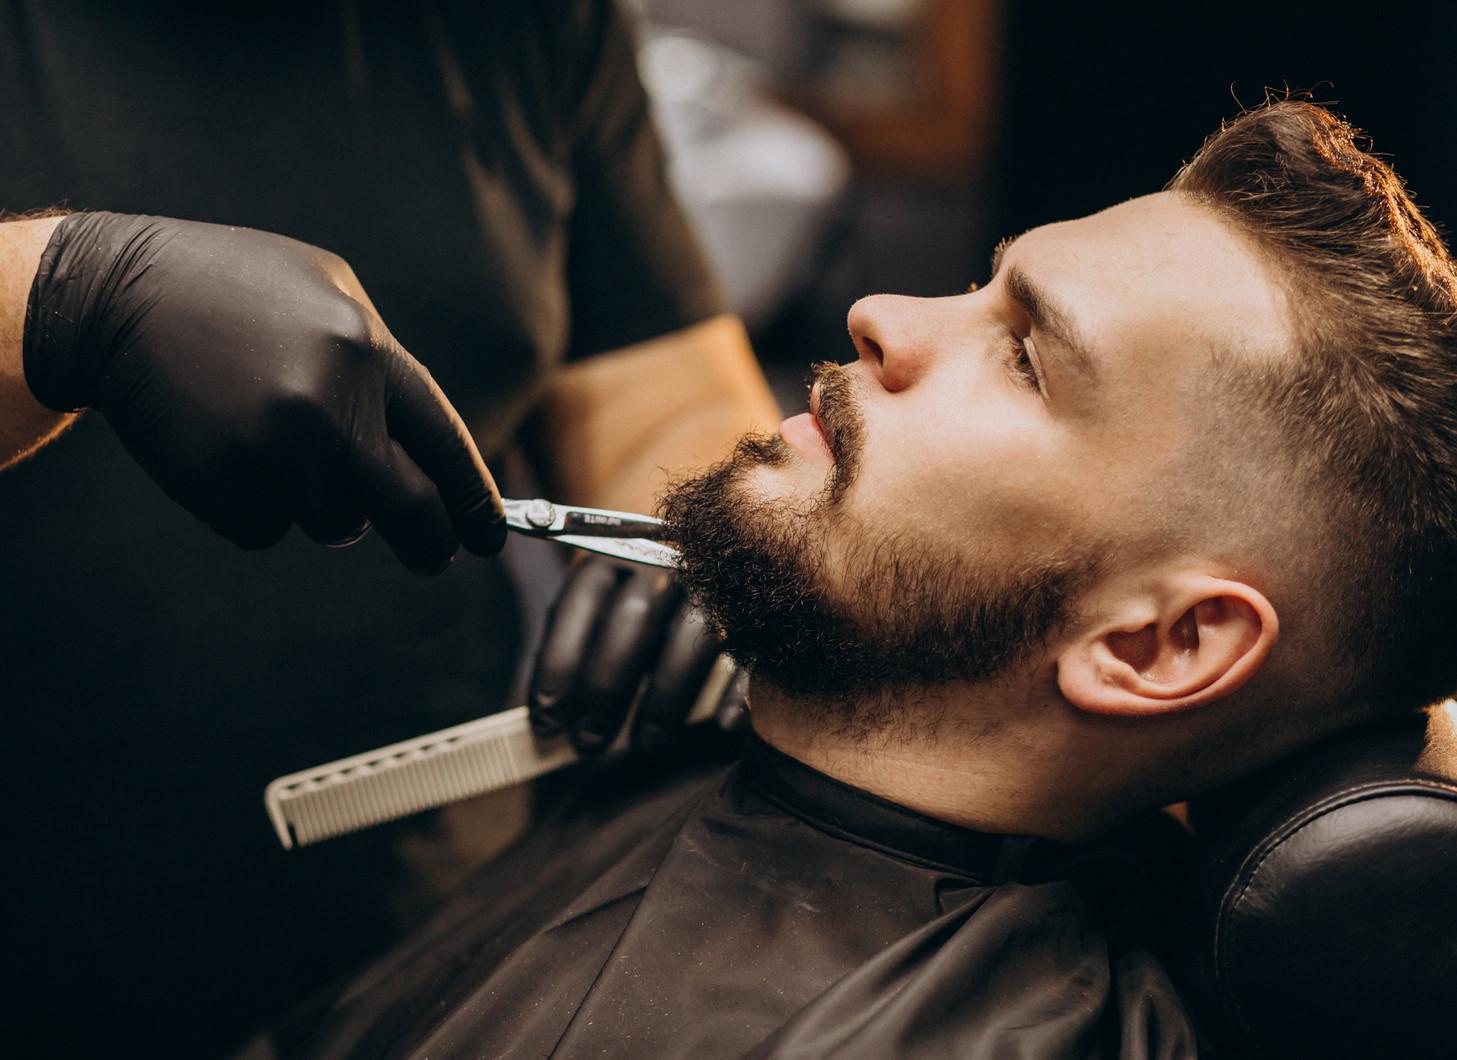 handsome-man-cutting-beard-barber-shop-s